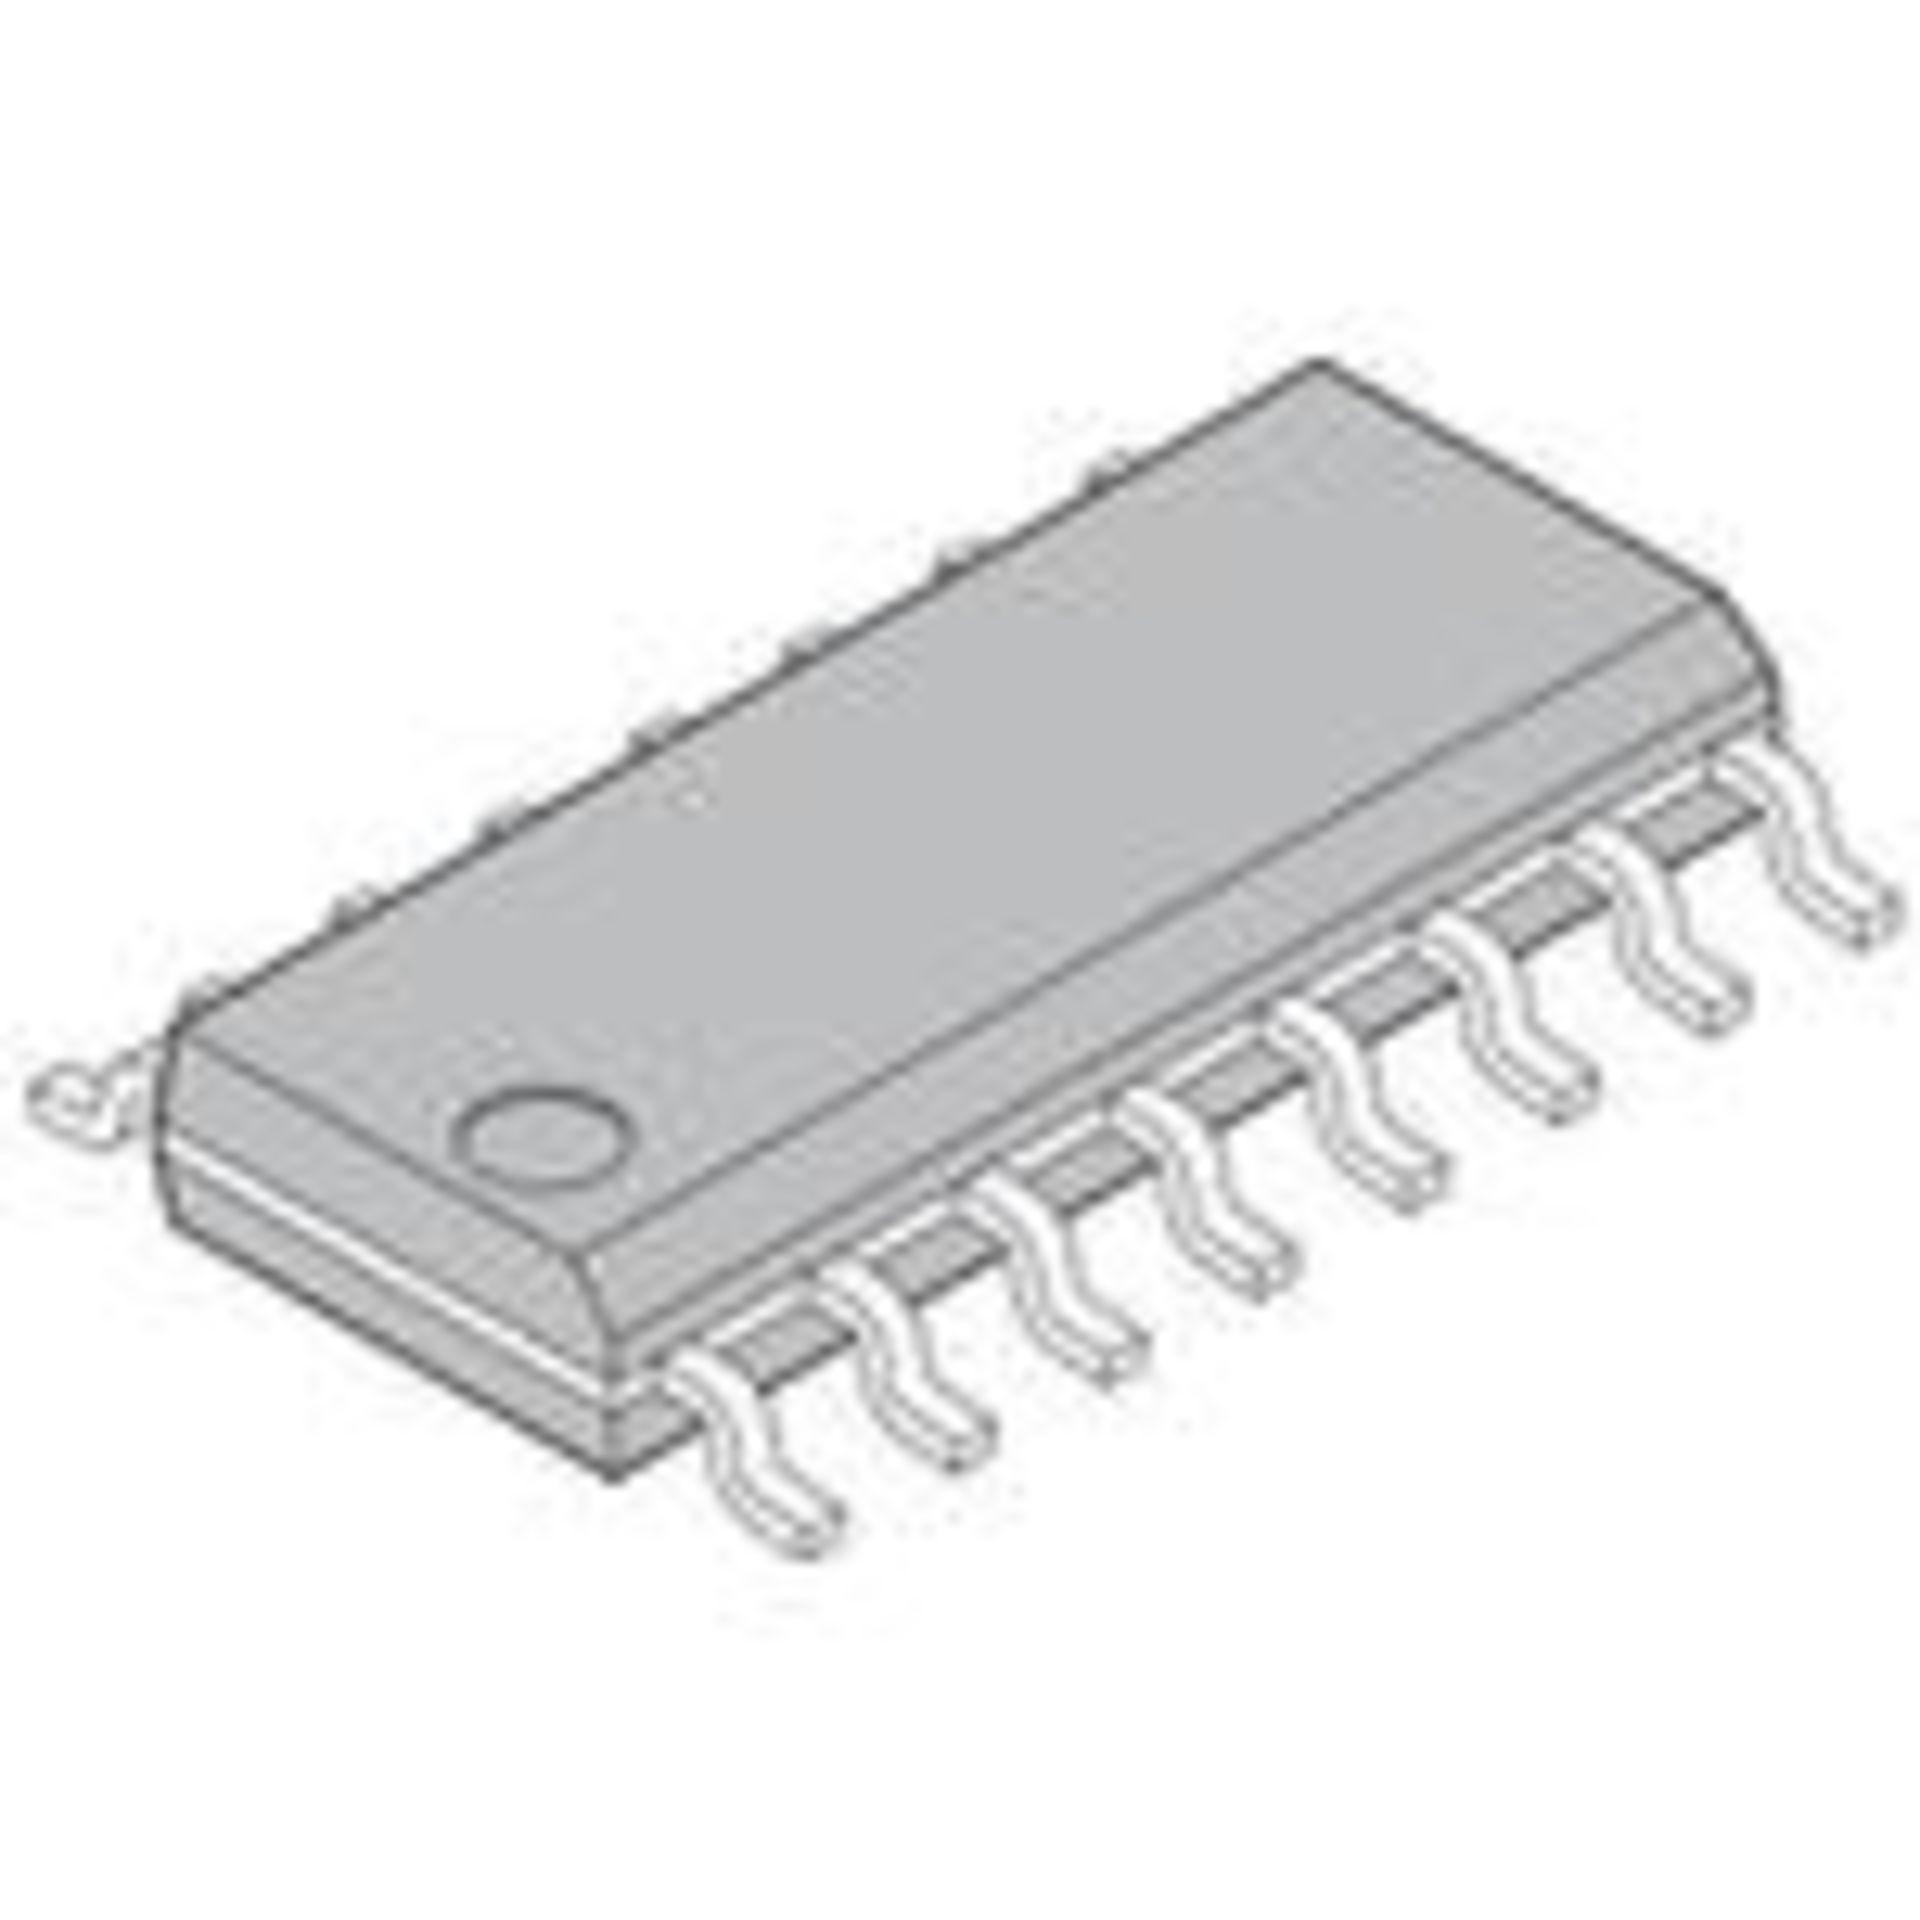 Cypress - An Infineon Technologies Company, S25FL256SAGMFI000, NOR Flash Serial (SPI, Dual SPI, Quad